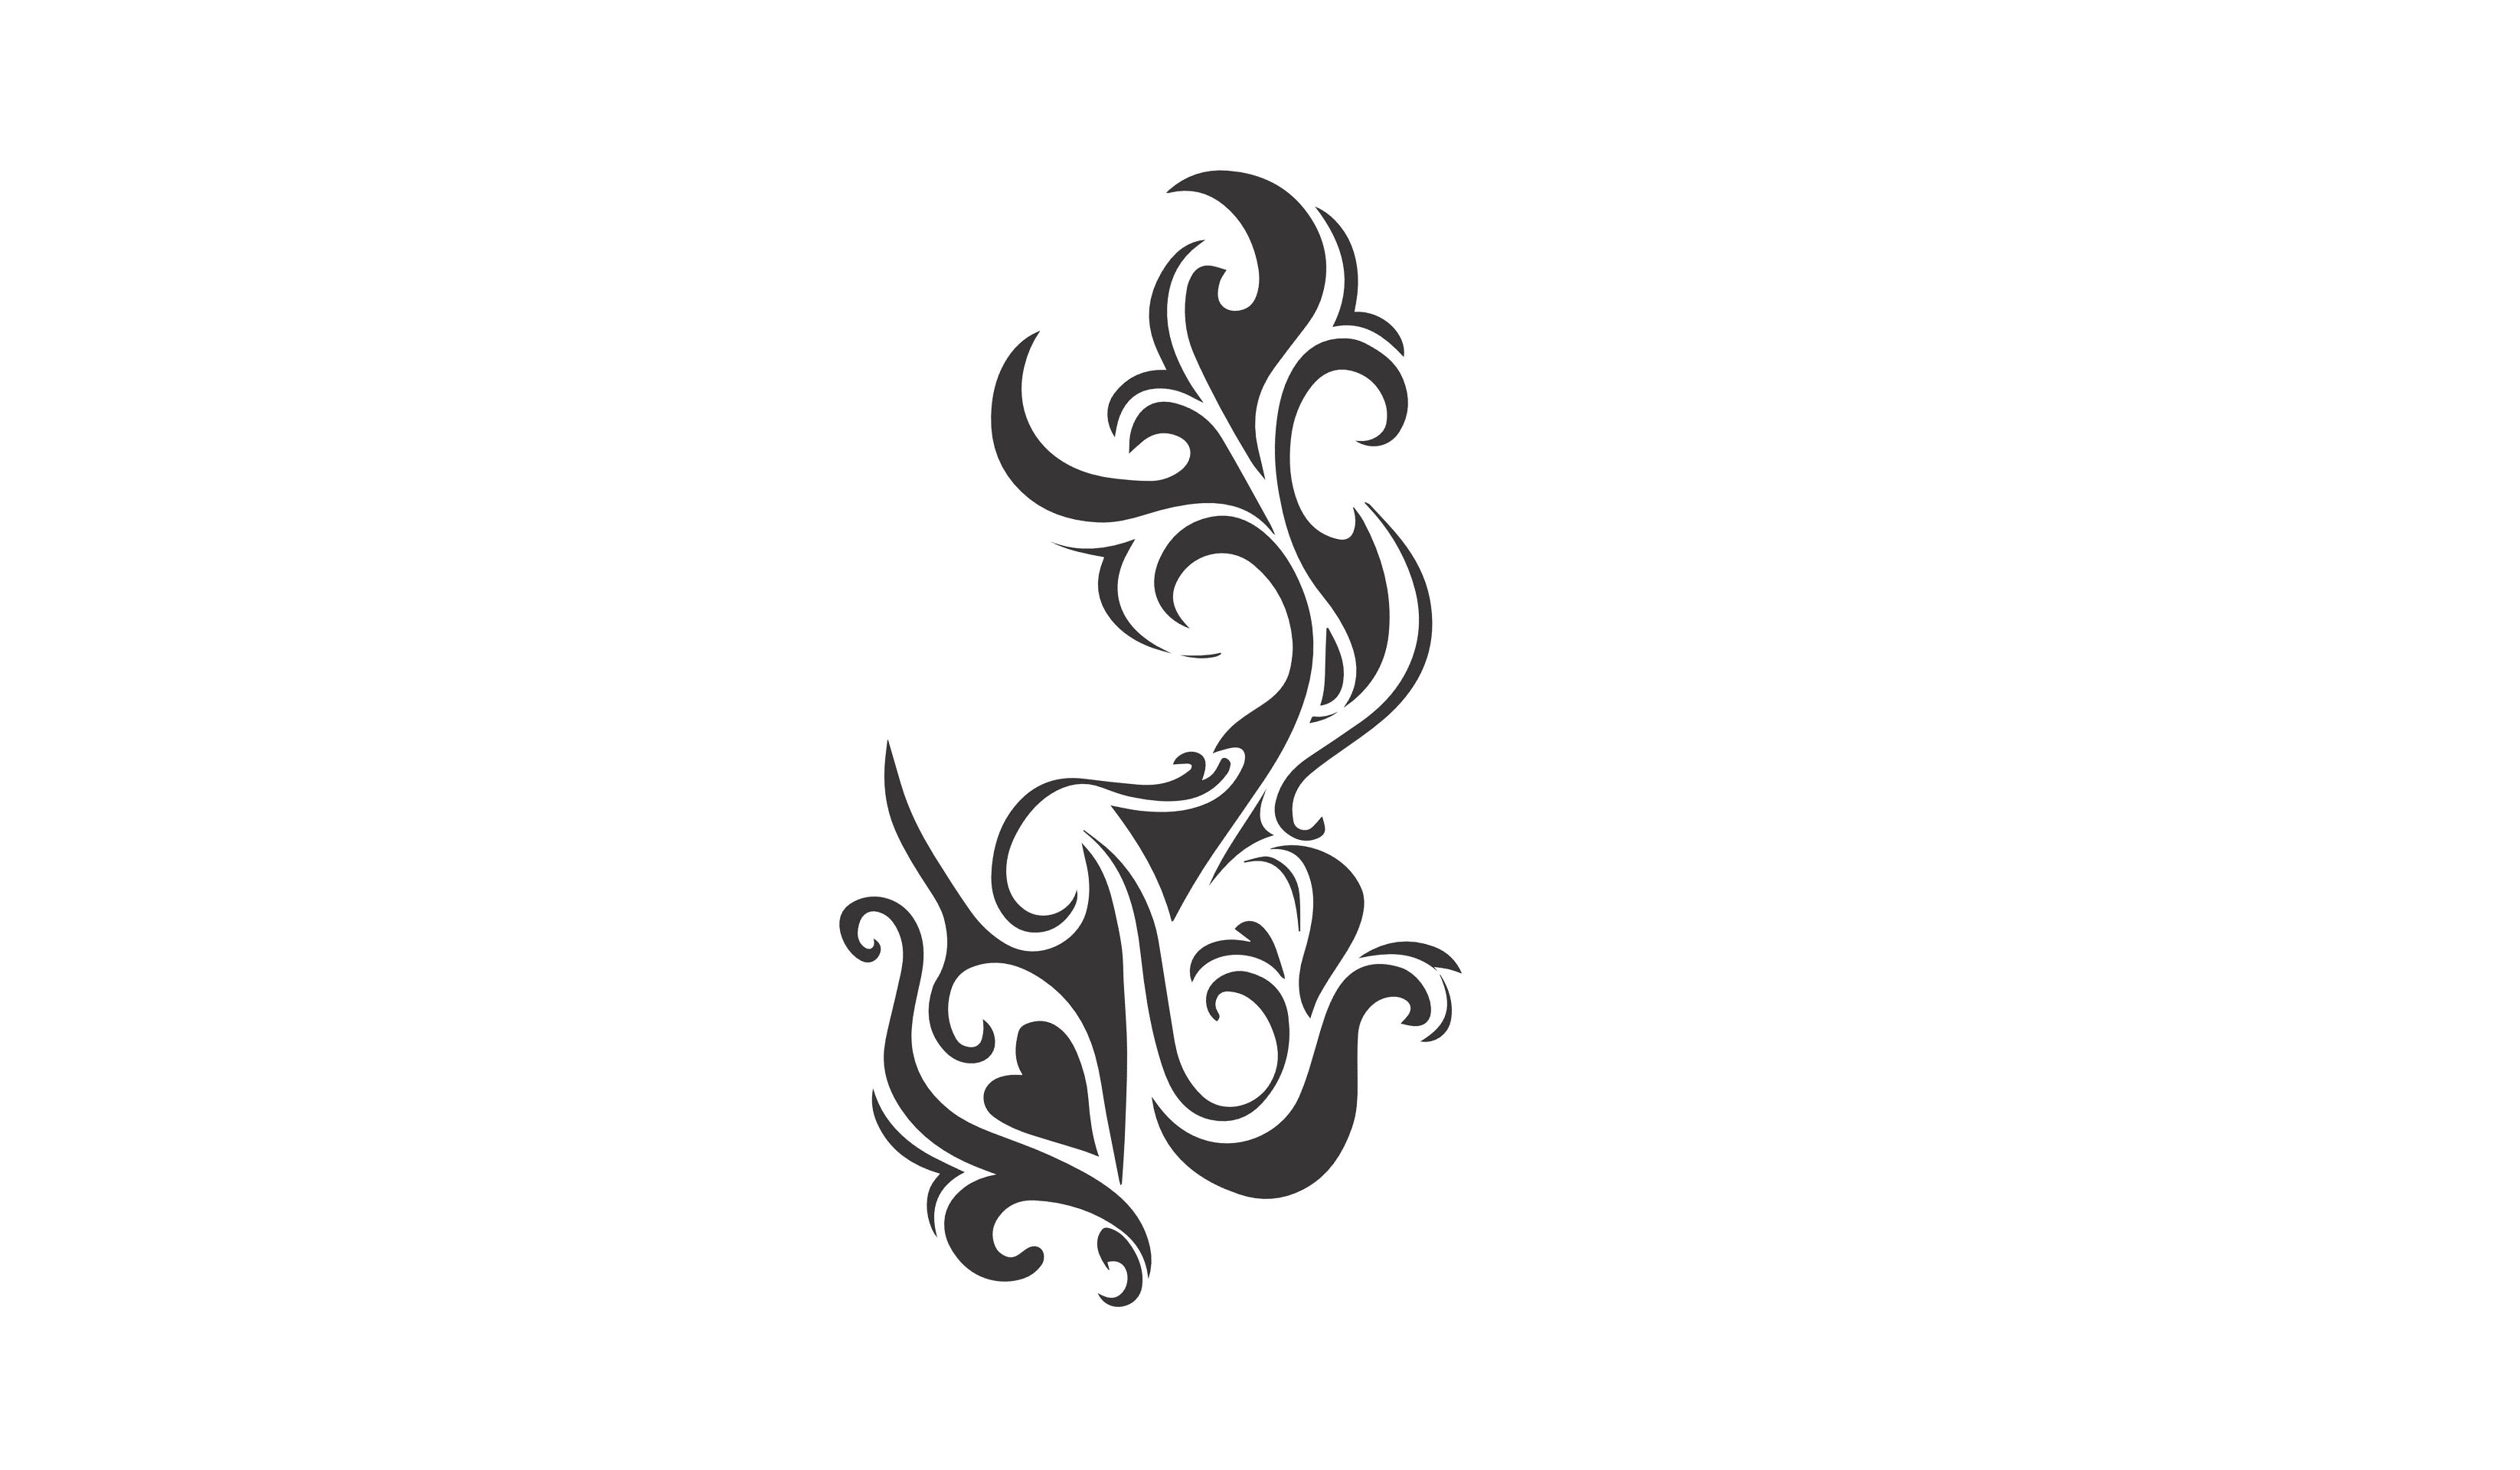 Top 20: Best Simple Tattoo Designs - Ideas To Print, Free Download - Free Tattoo Stencils Printable